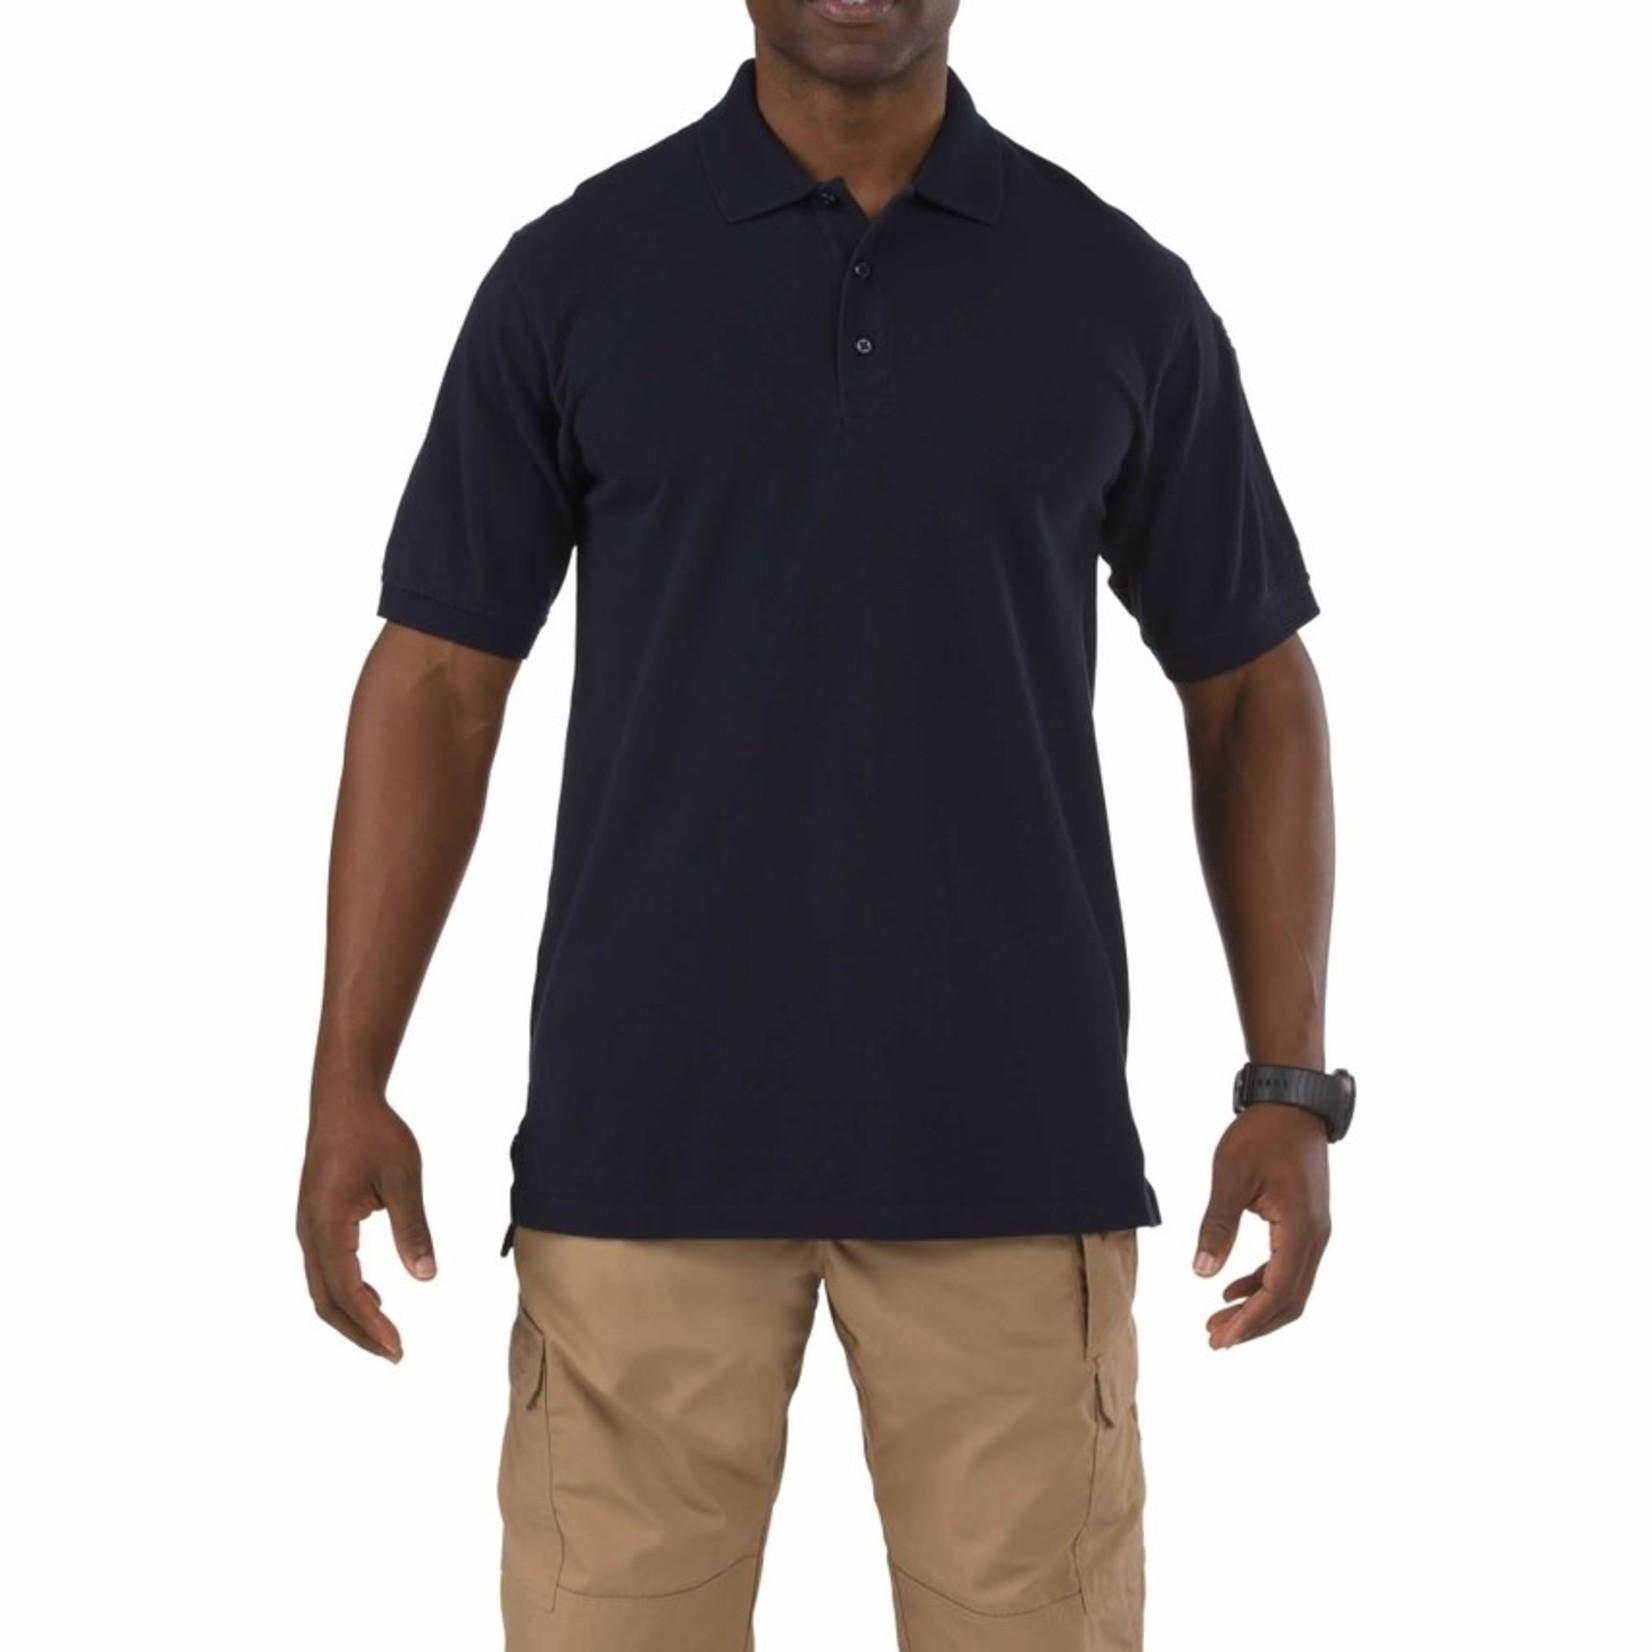 5.11 Tactical 5.11 Men's Professional S/S Polo- Medium